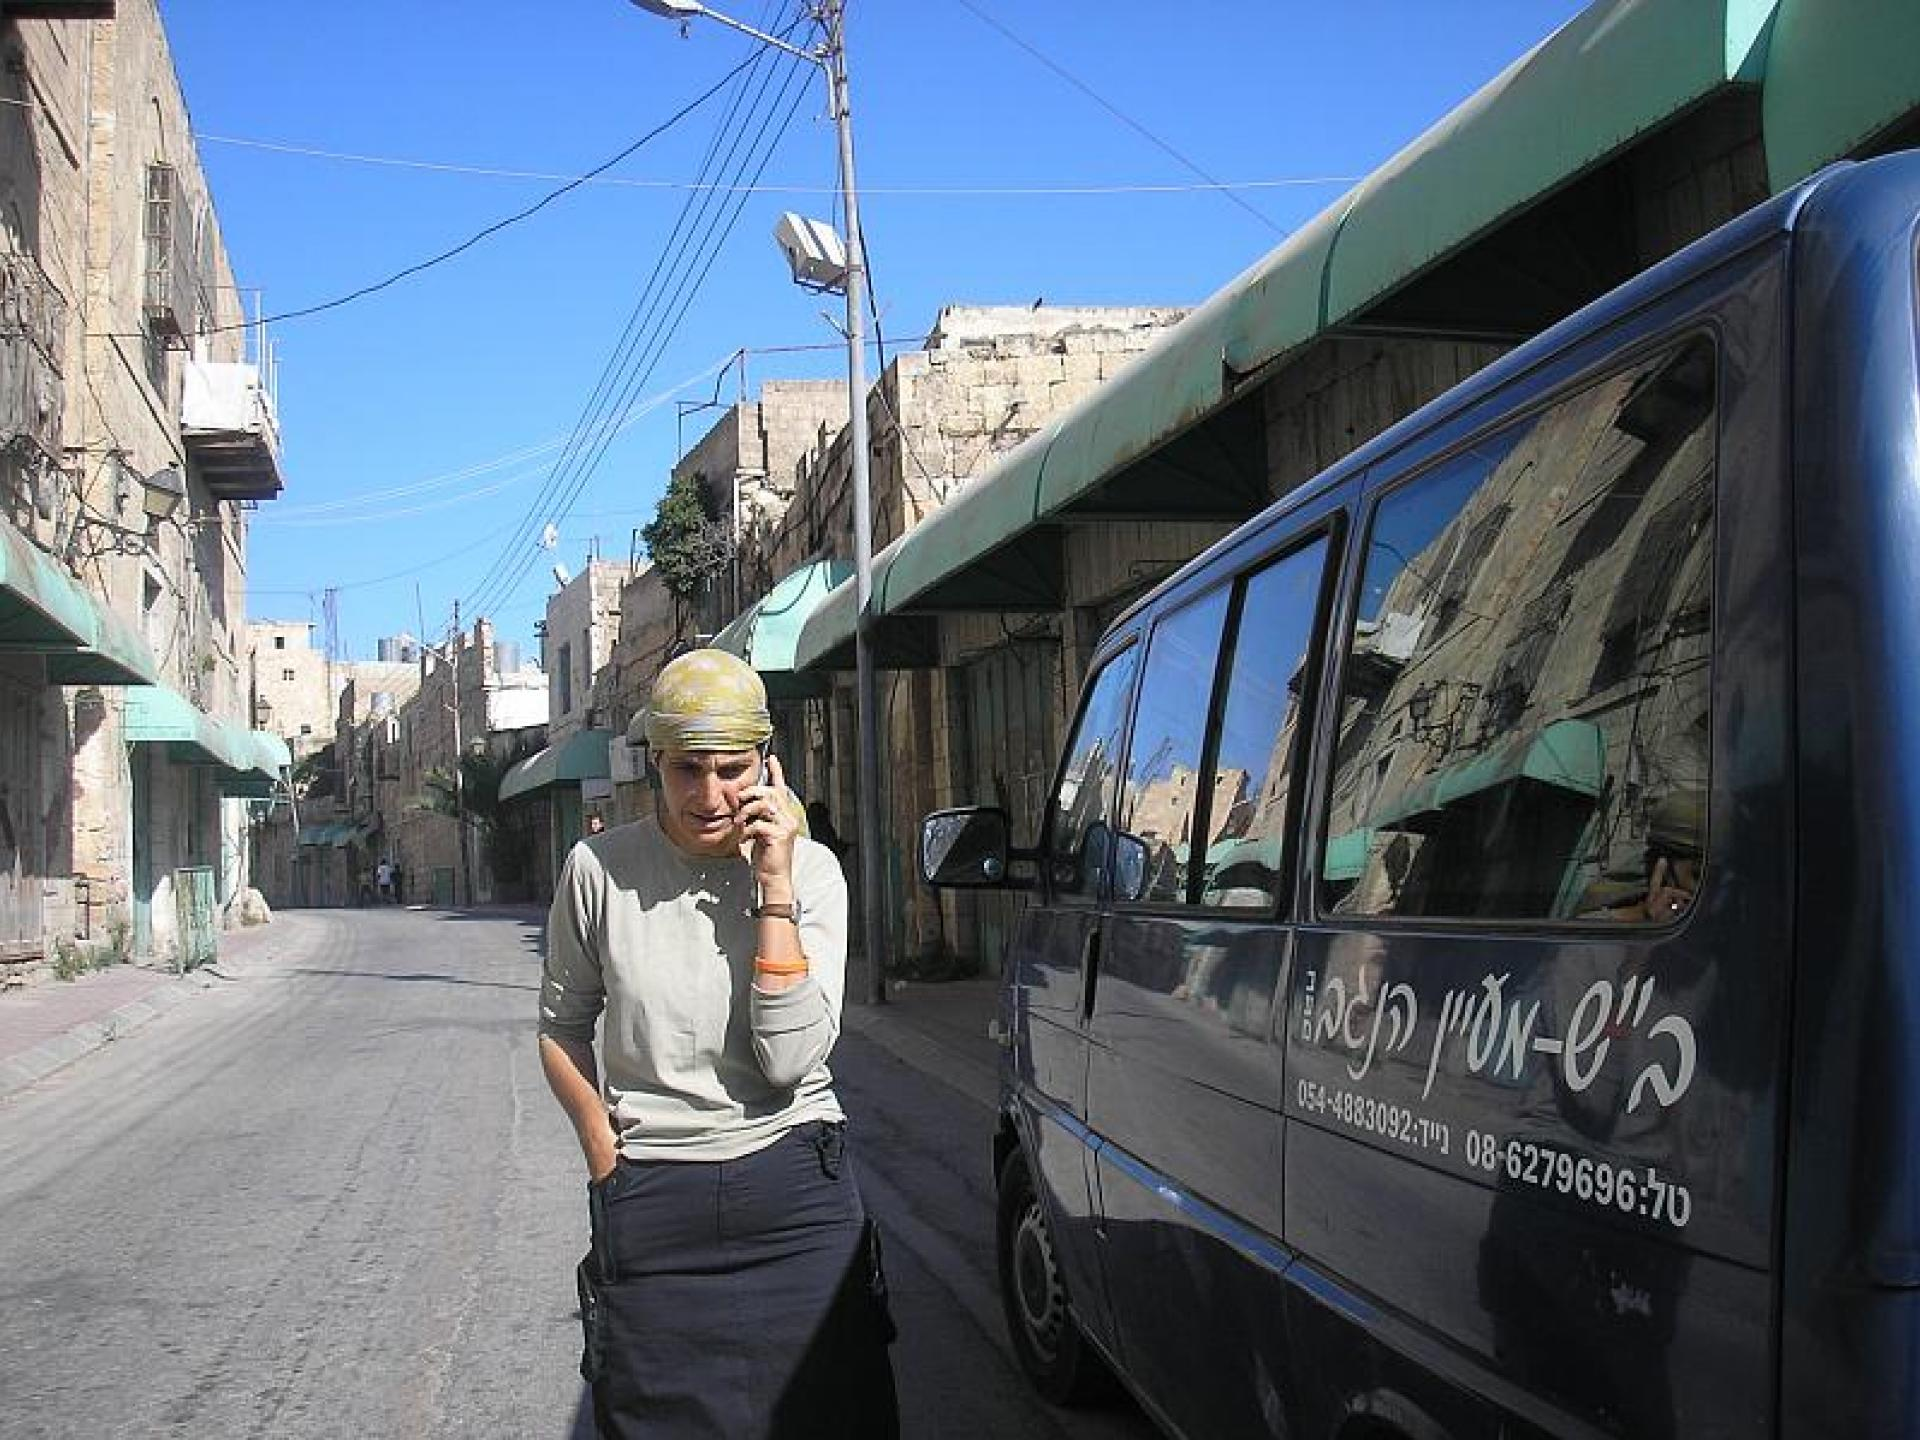 Hebron 04.08.09